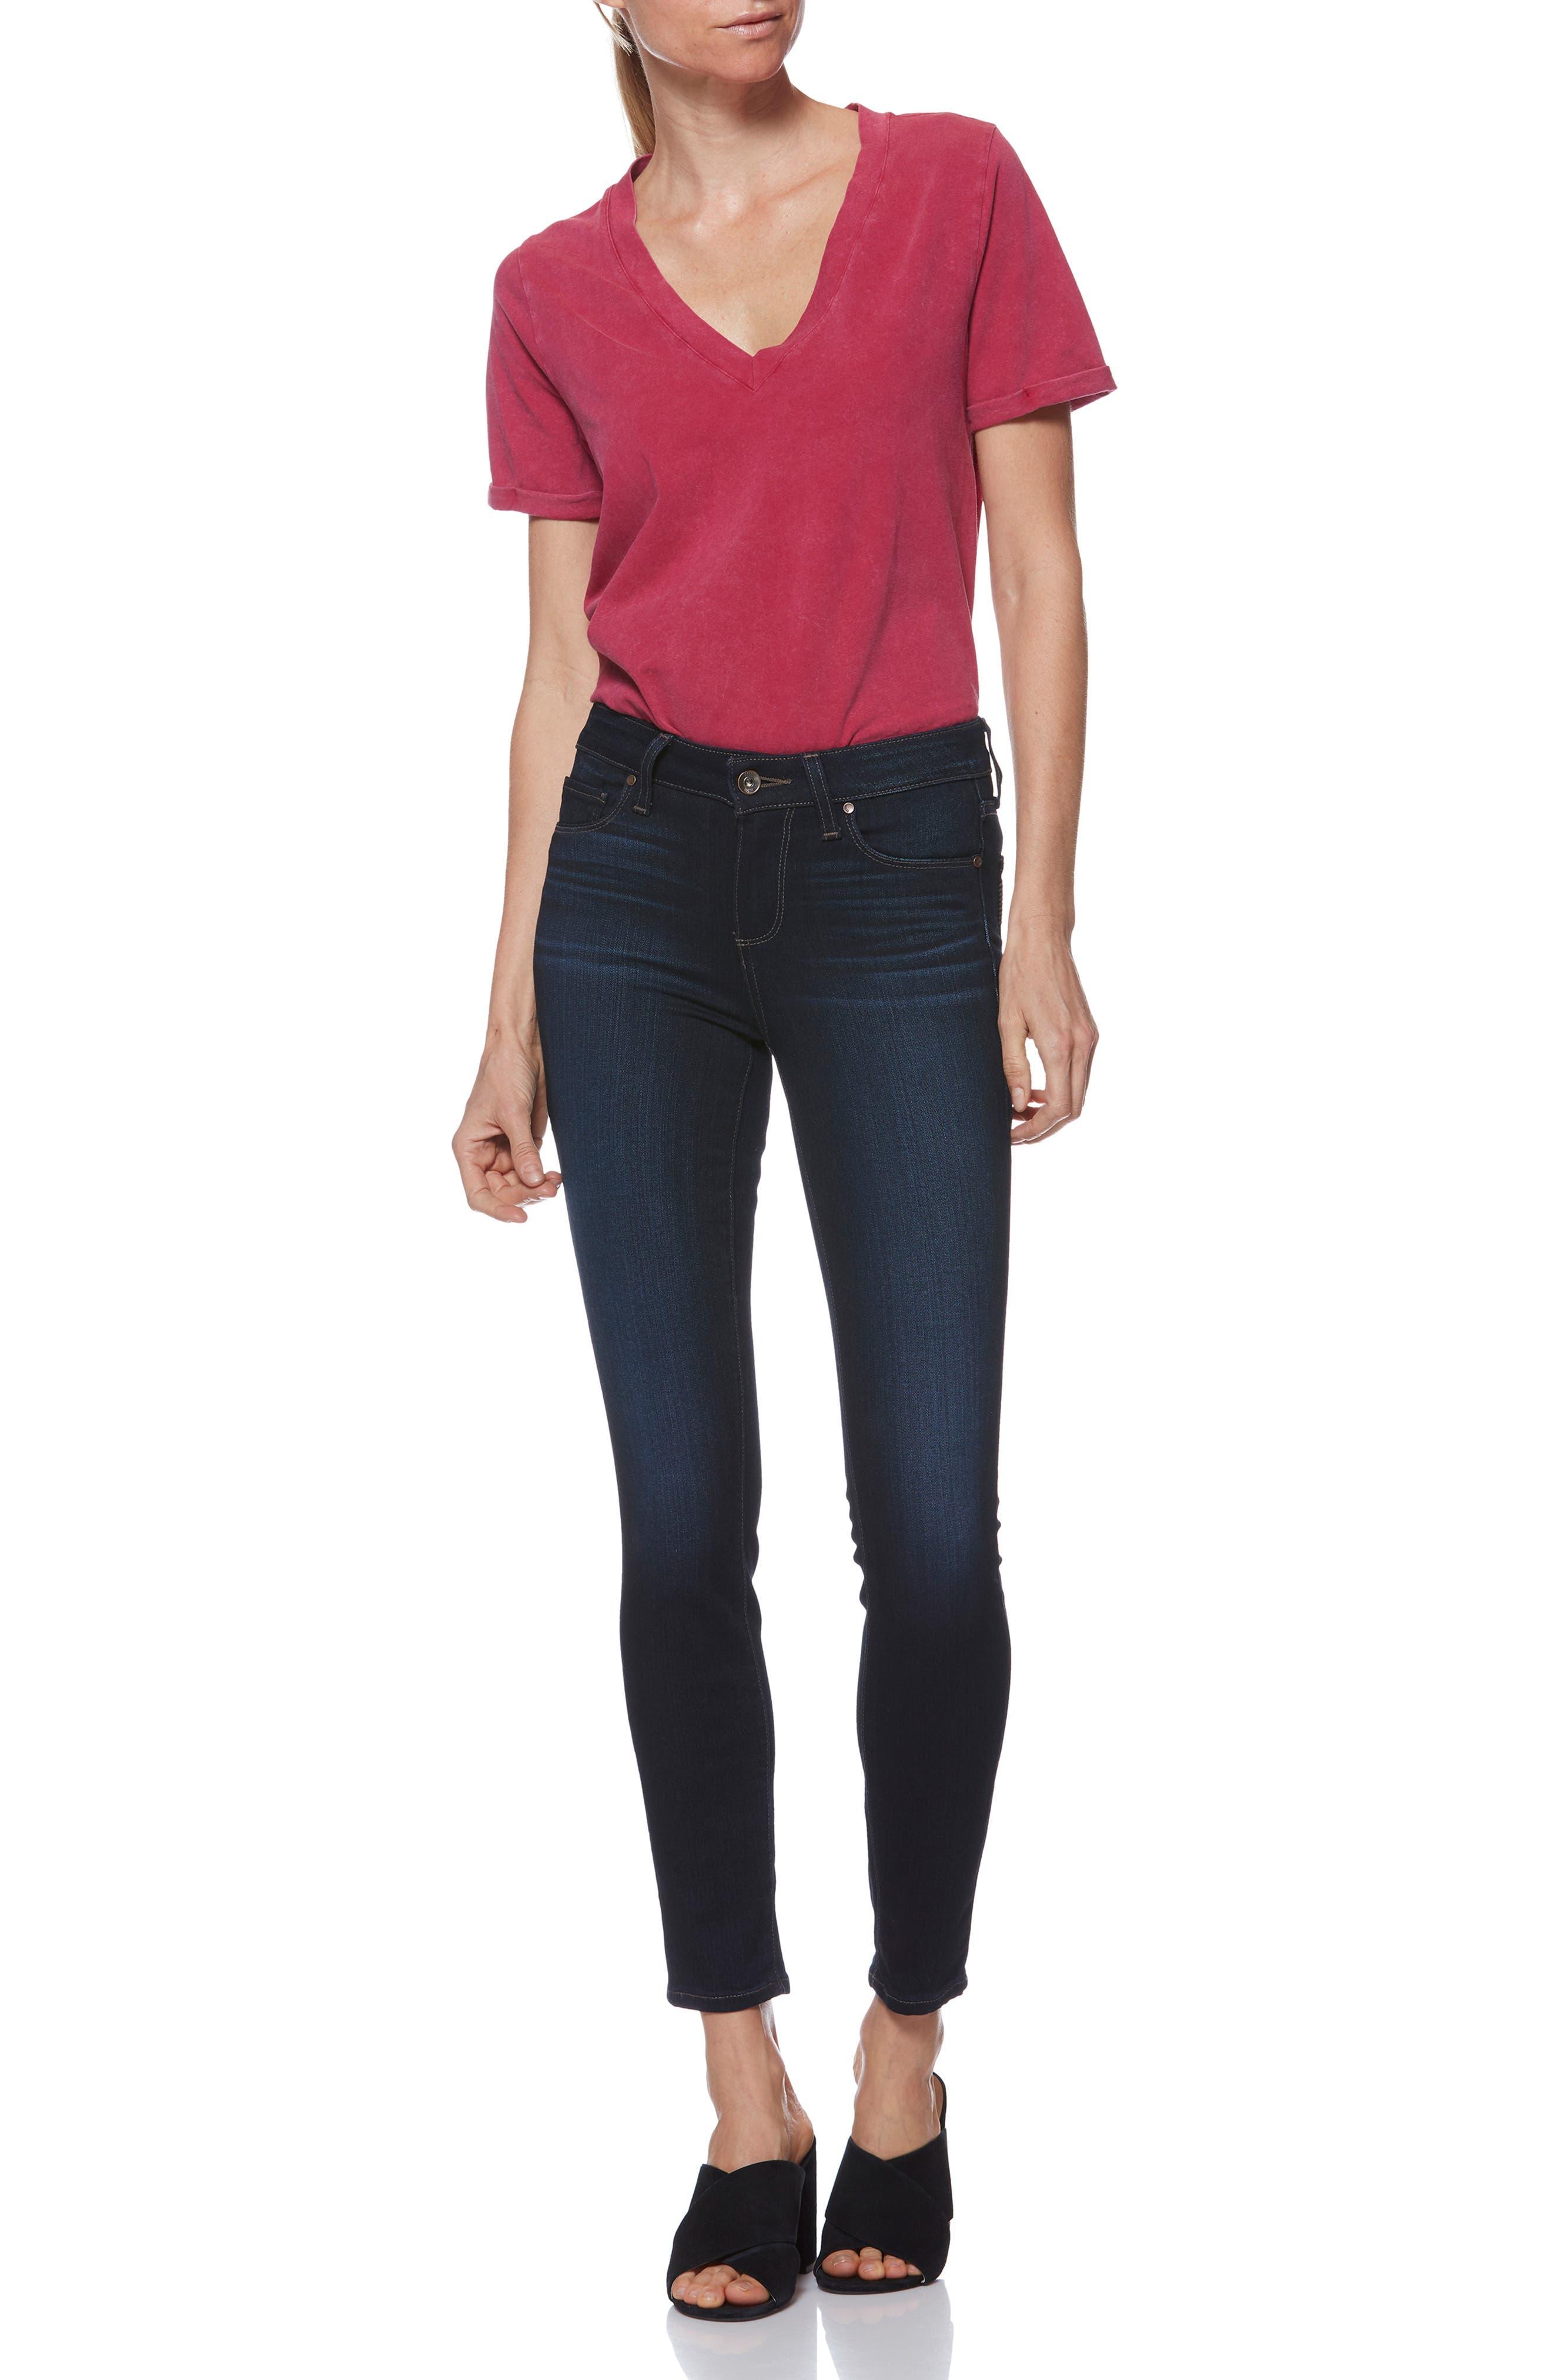 Transcend - Verdugo Ankle Skinny Jeans,                             Alternate thumbnail 8, color,                             400